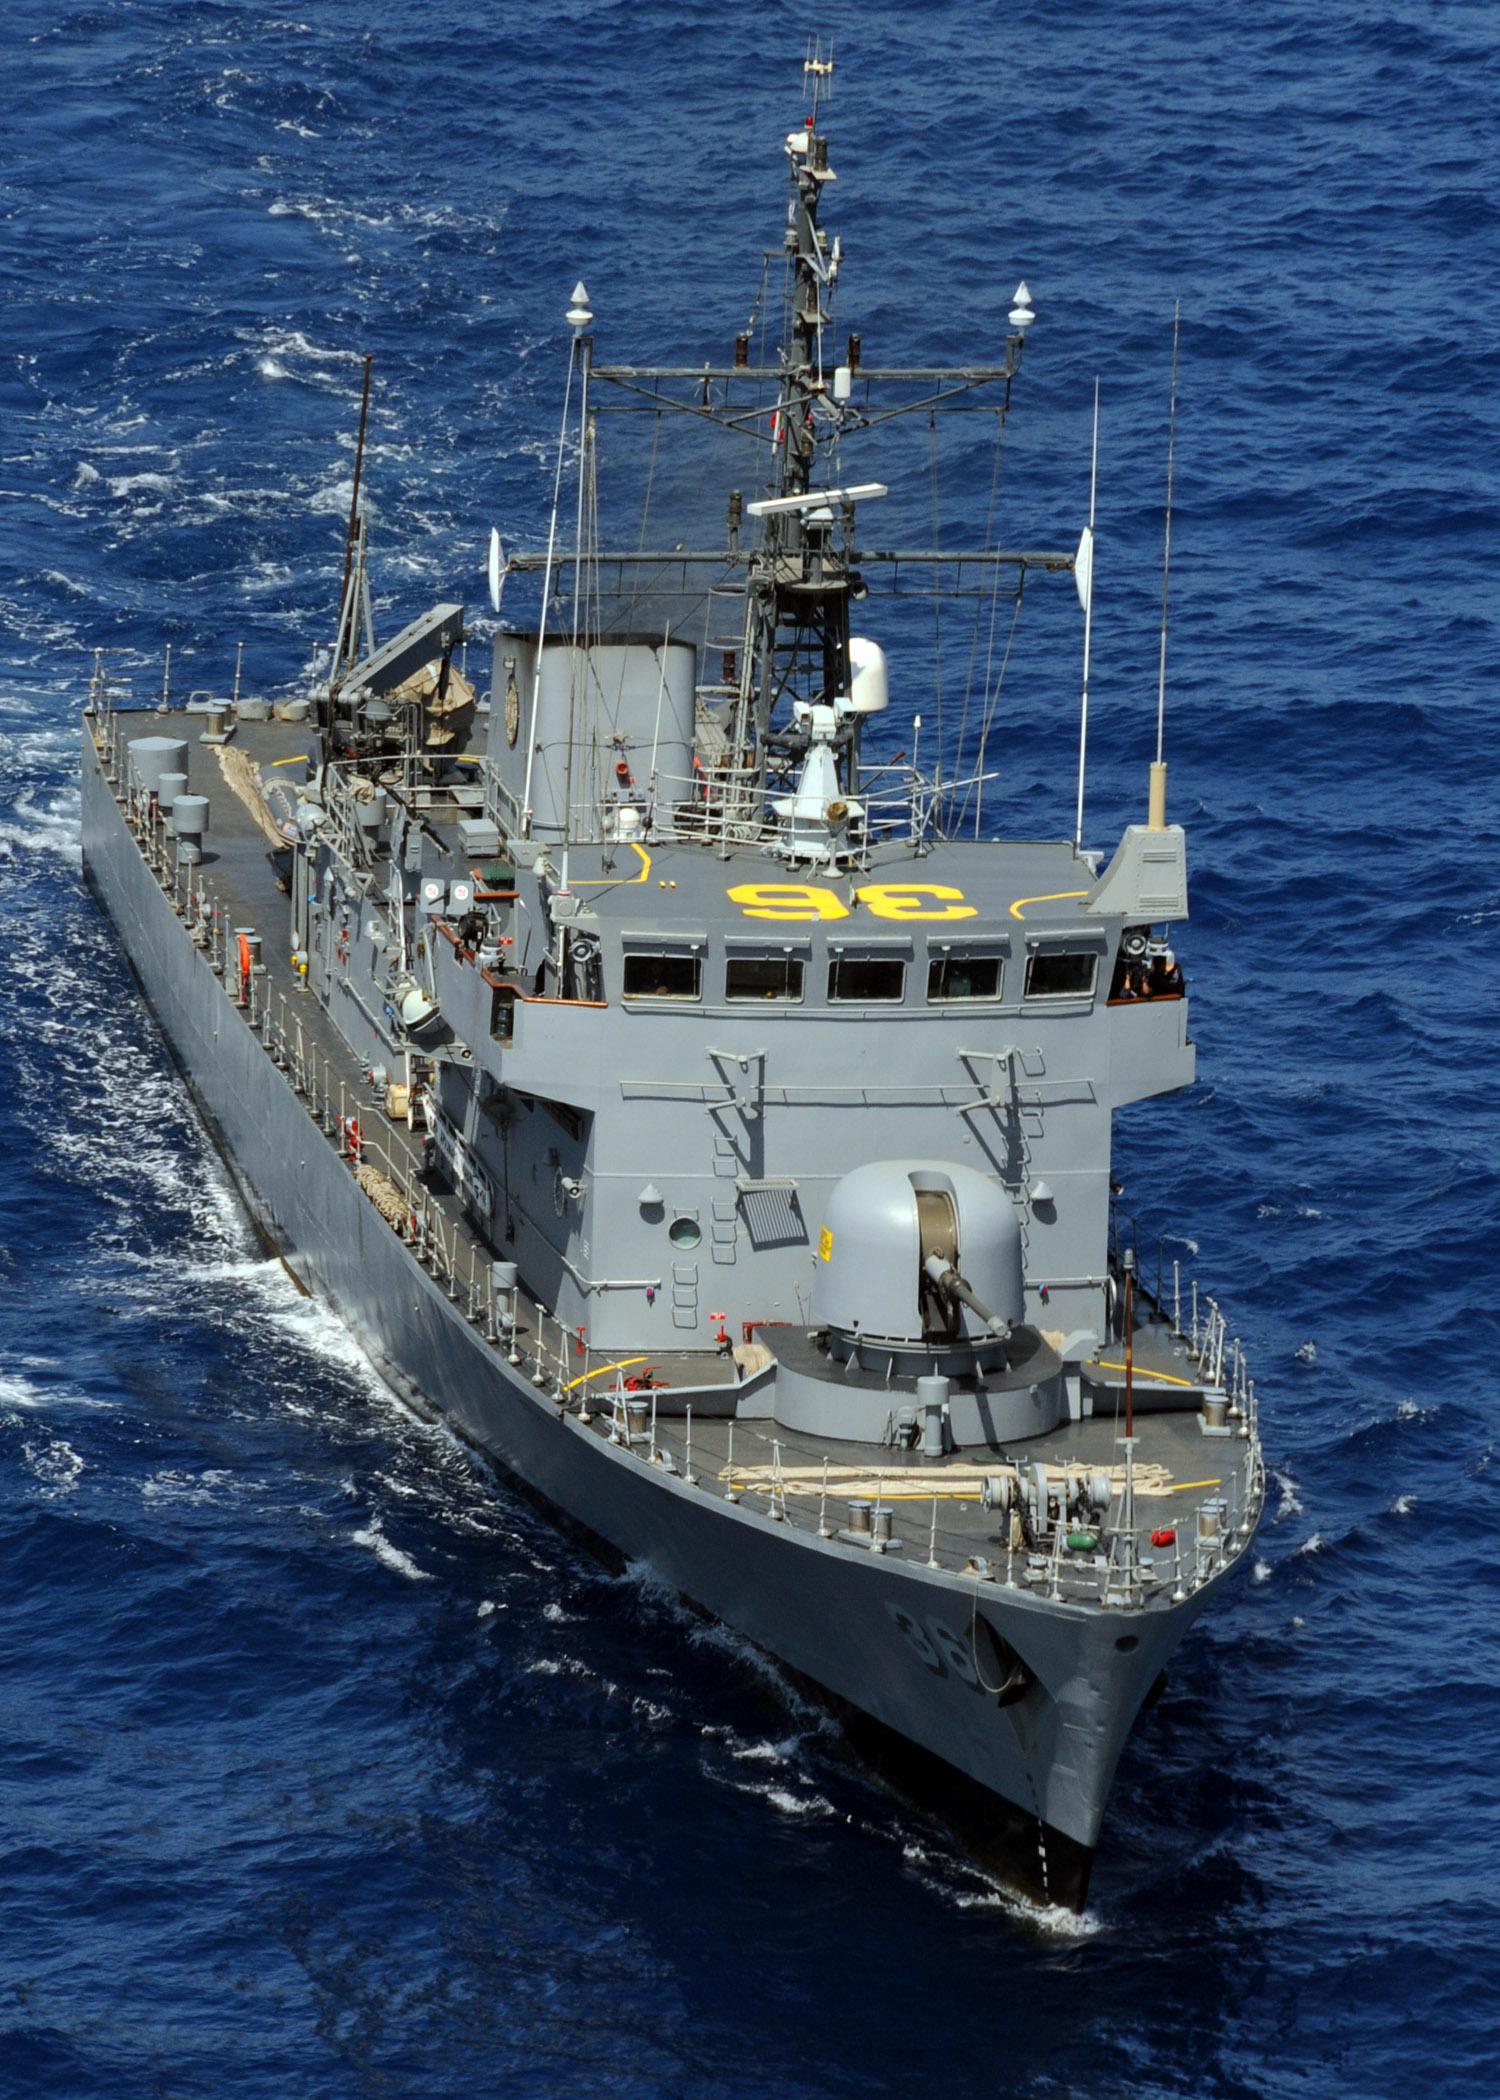 File:Philippine Navy PS-36 at Balikatan 2010-2.jpg - Wikimedia Commons